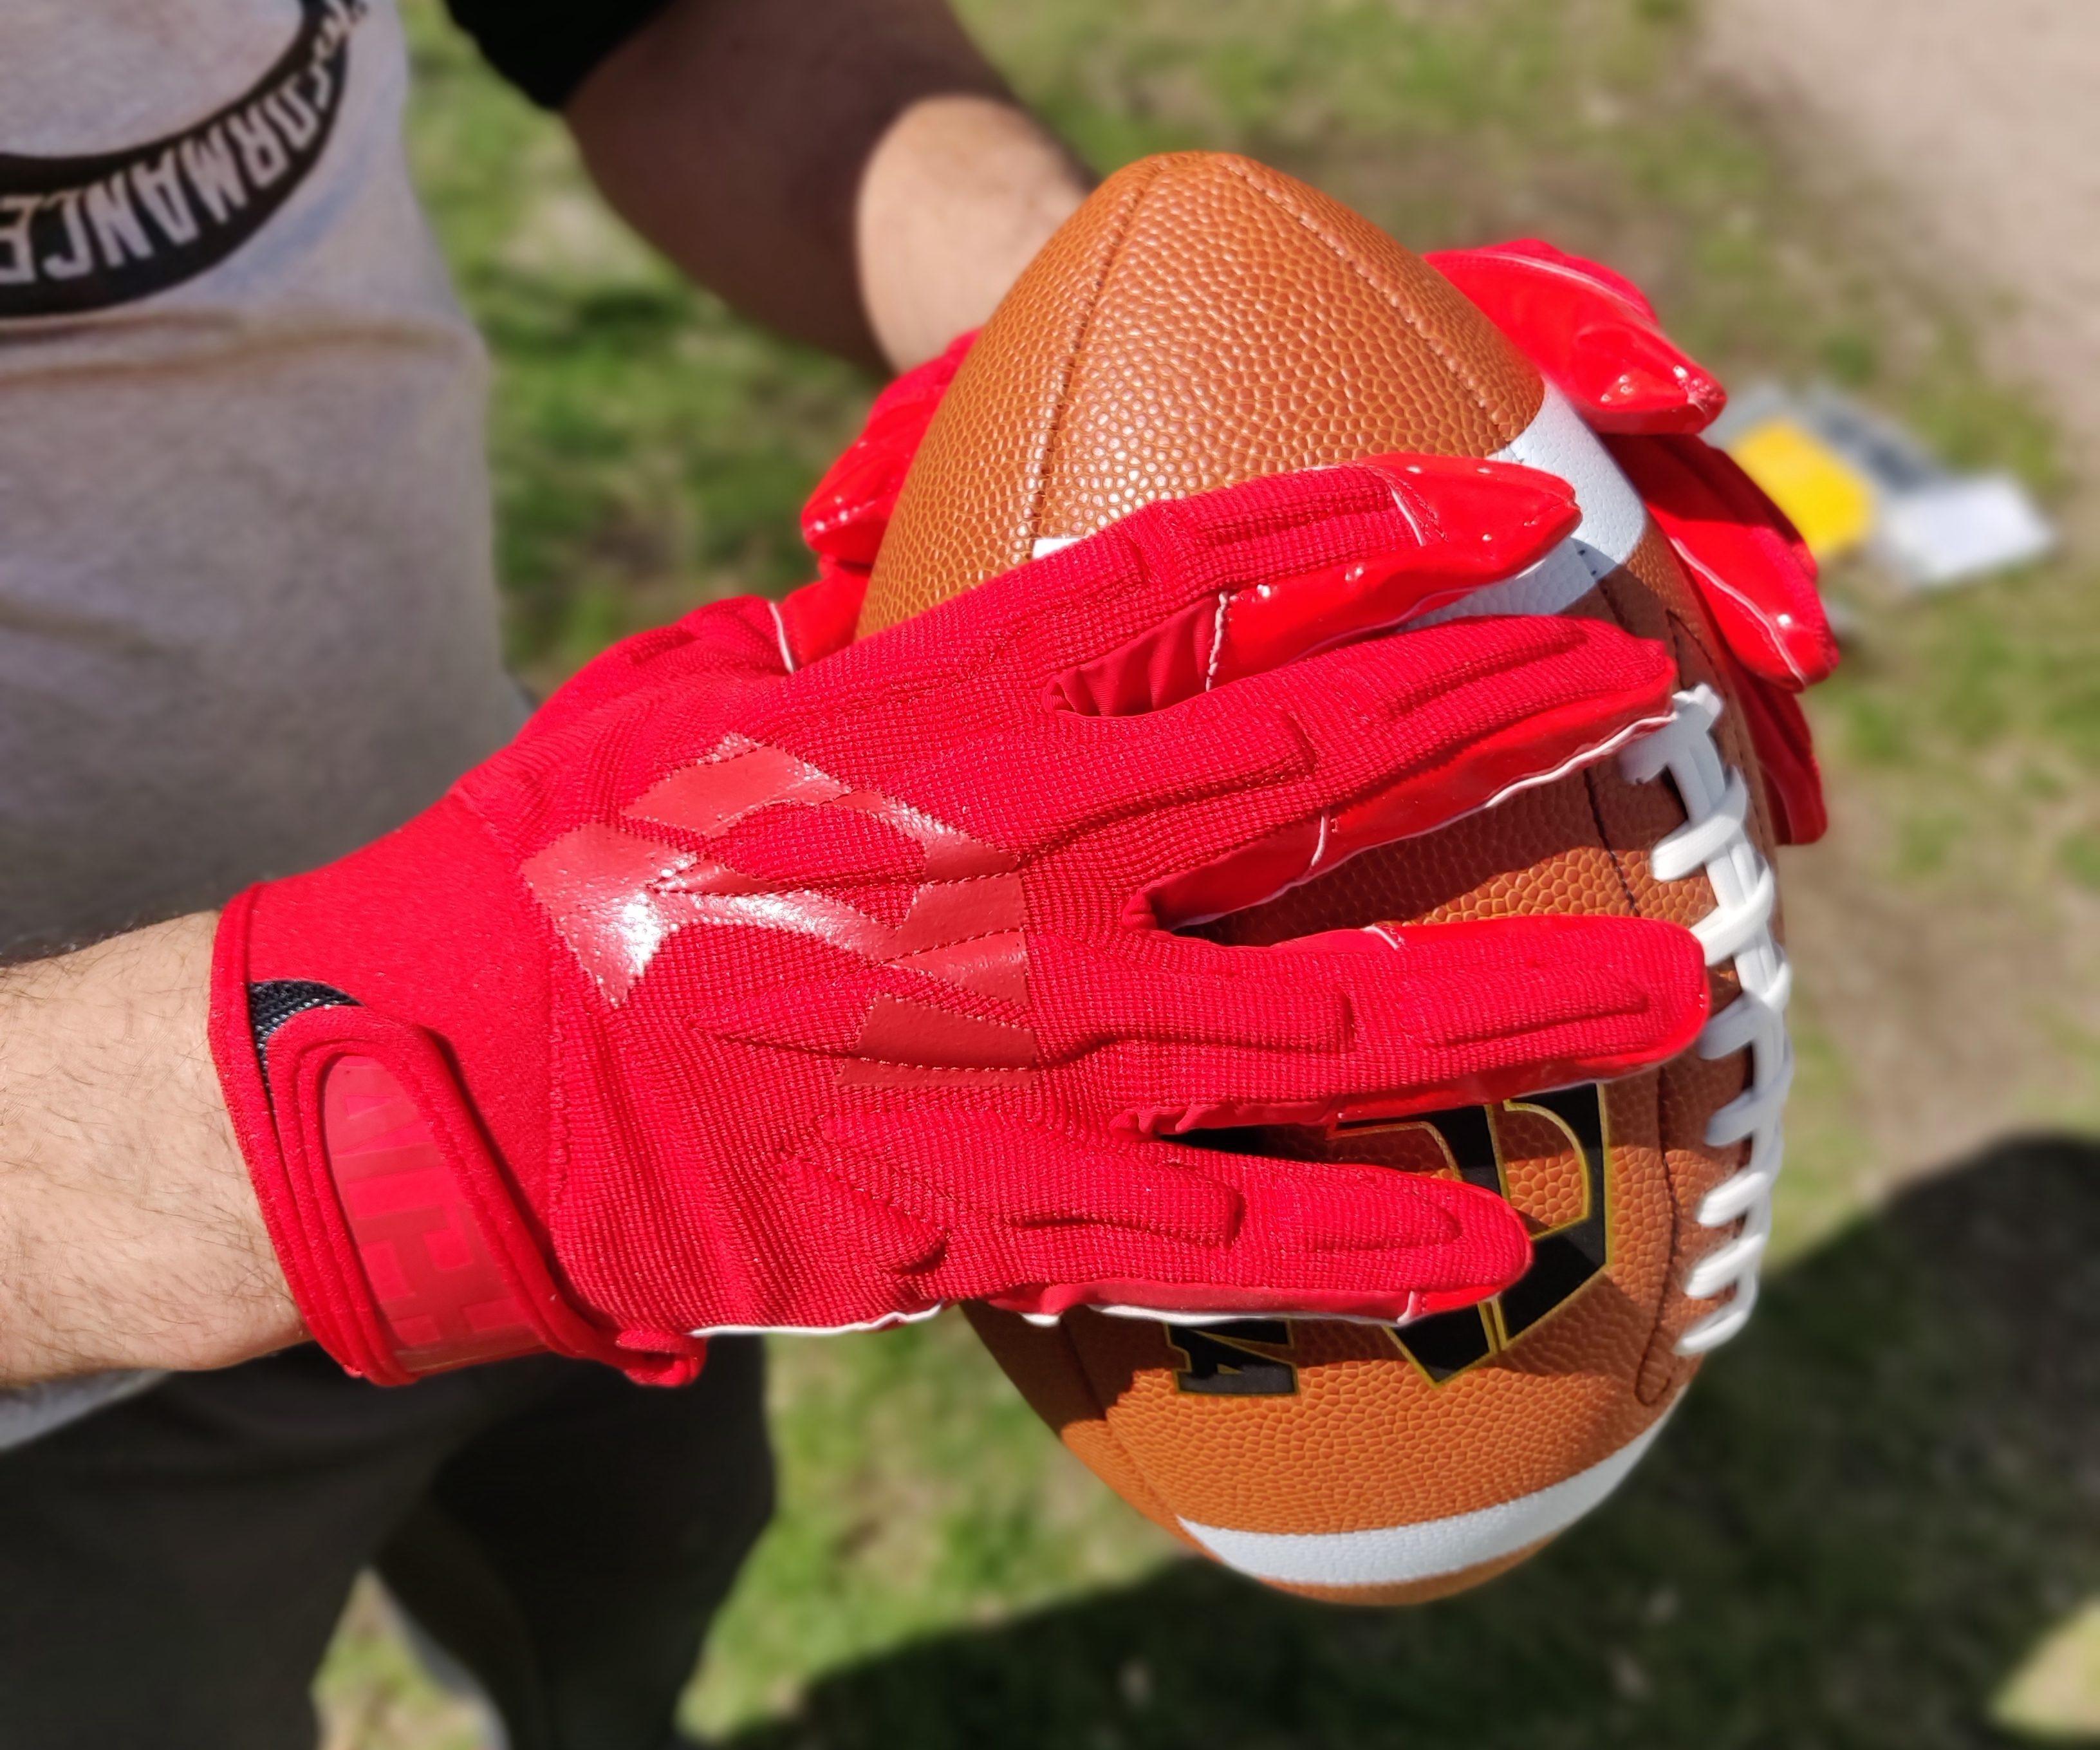 Fuse Alpha Padded Glove